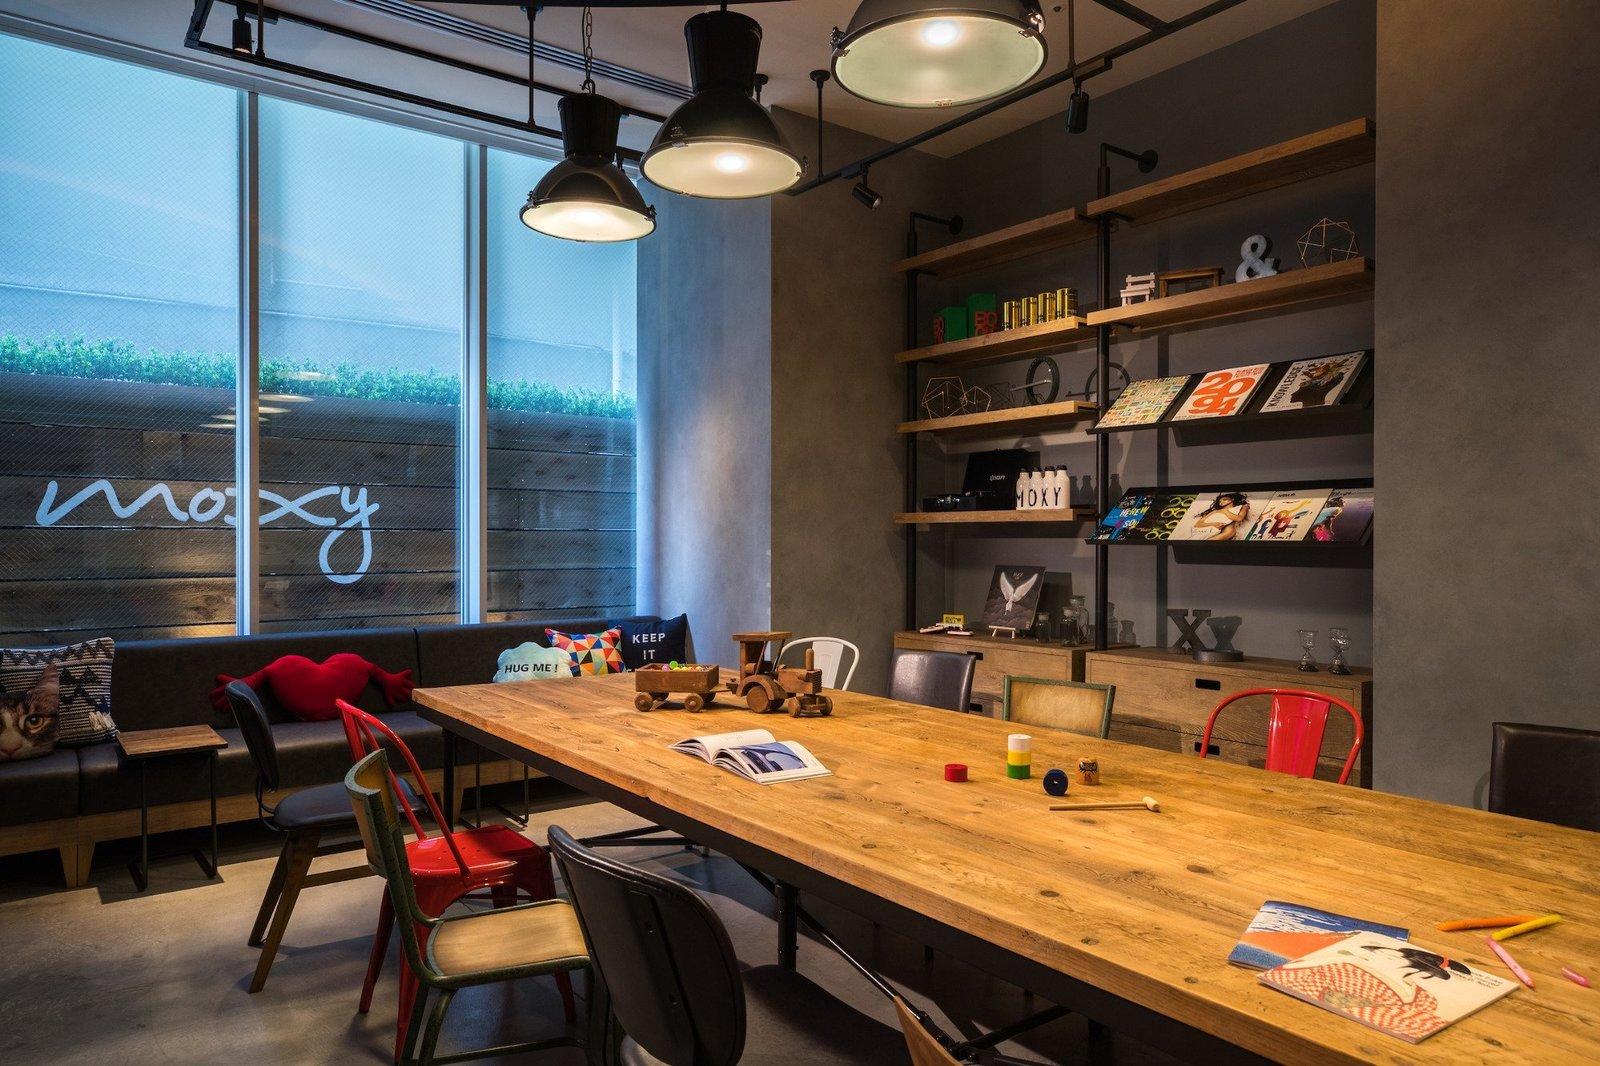 Living Room, Table, Pendant Lighting, Shelves, Concrete Floor, Chair, and Sofa  Moxy Osaka Honmachi